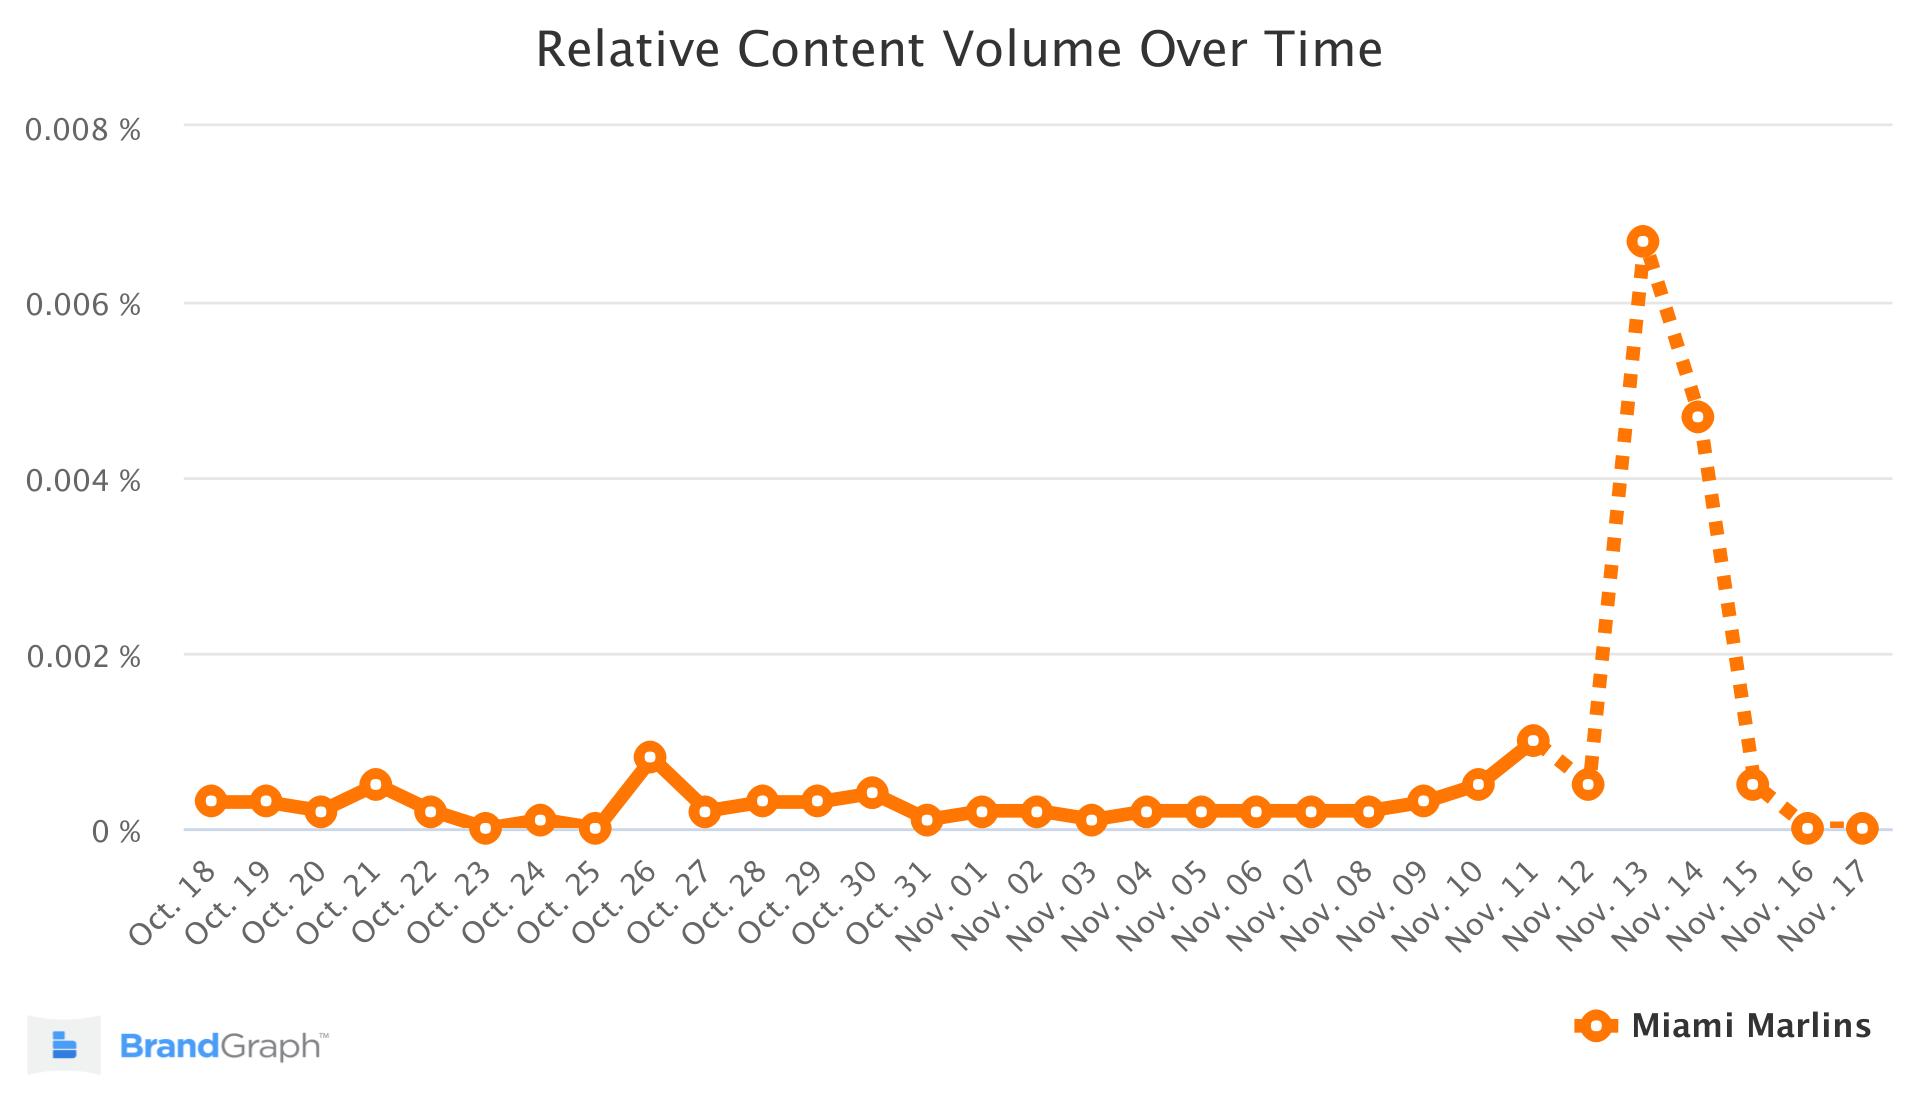 Miami Marlins BrandGraph Trend